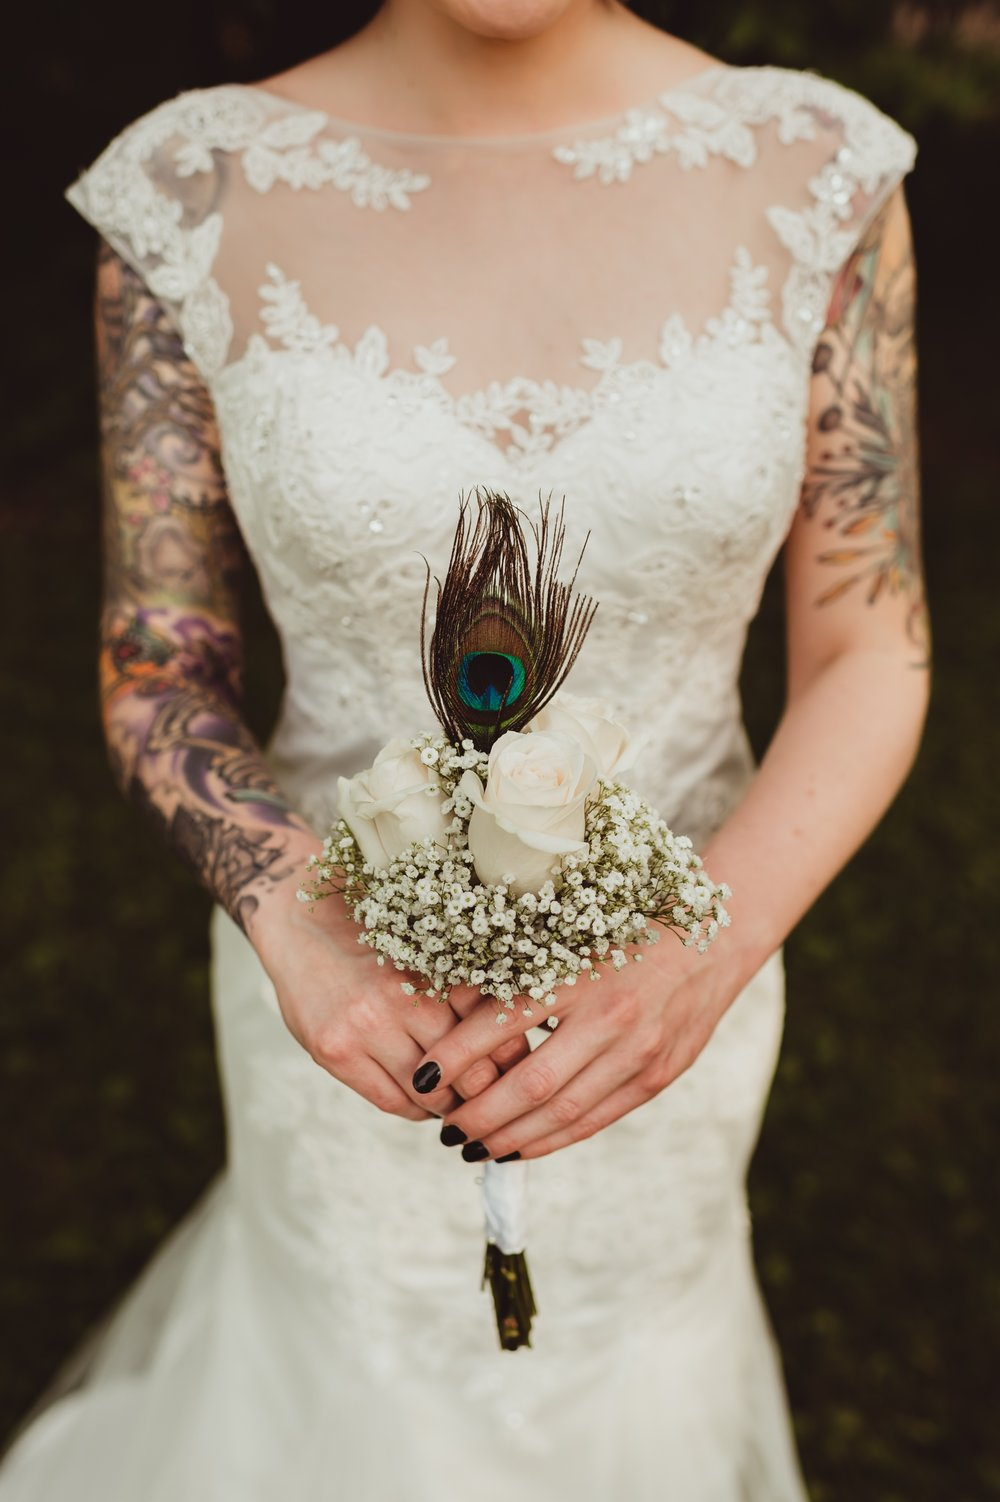 brittney-nestle-photo-wedding-alacarte.jpg